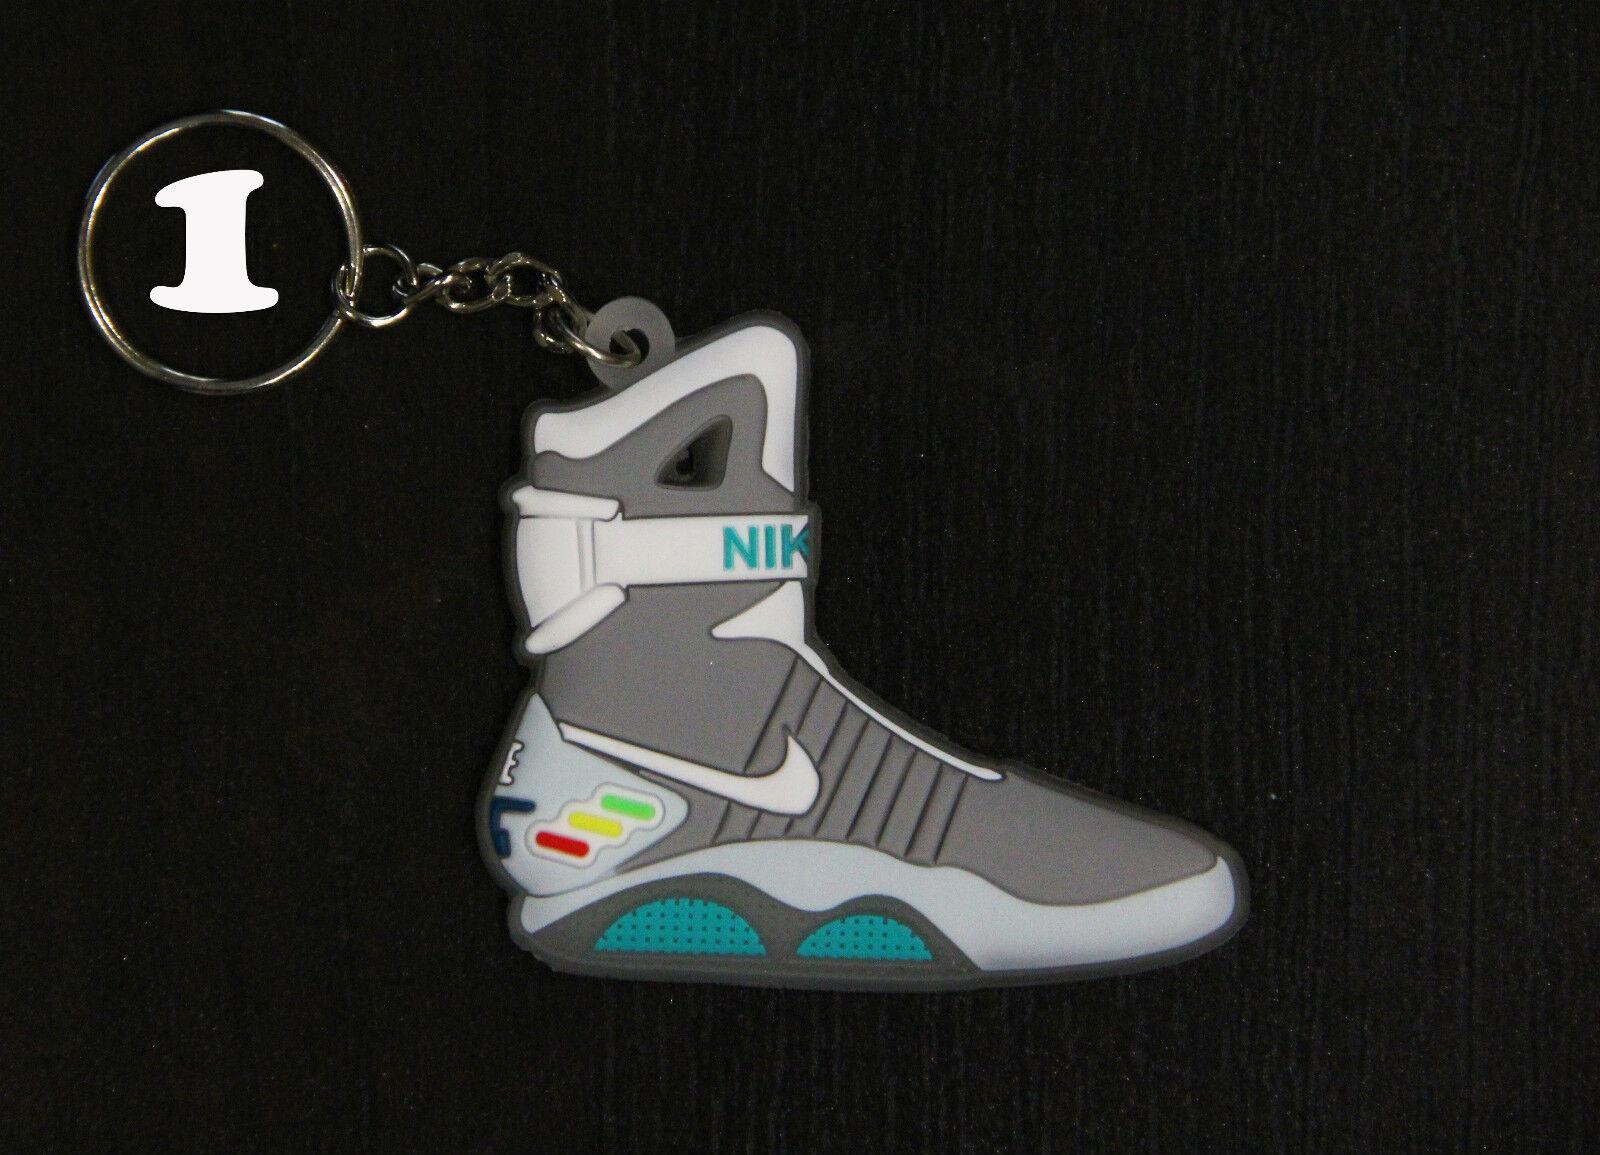 Nike kulcstartó kulcstartók mini sneaker modell MAG Jordan Dunk Air Max